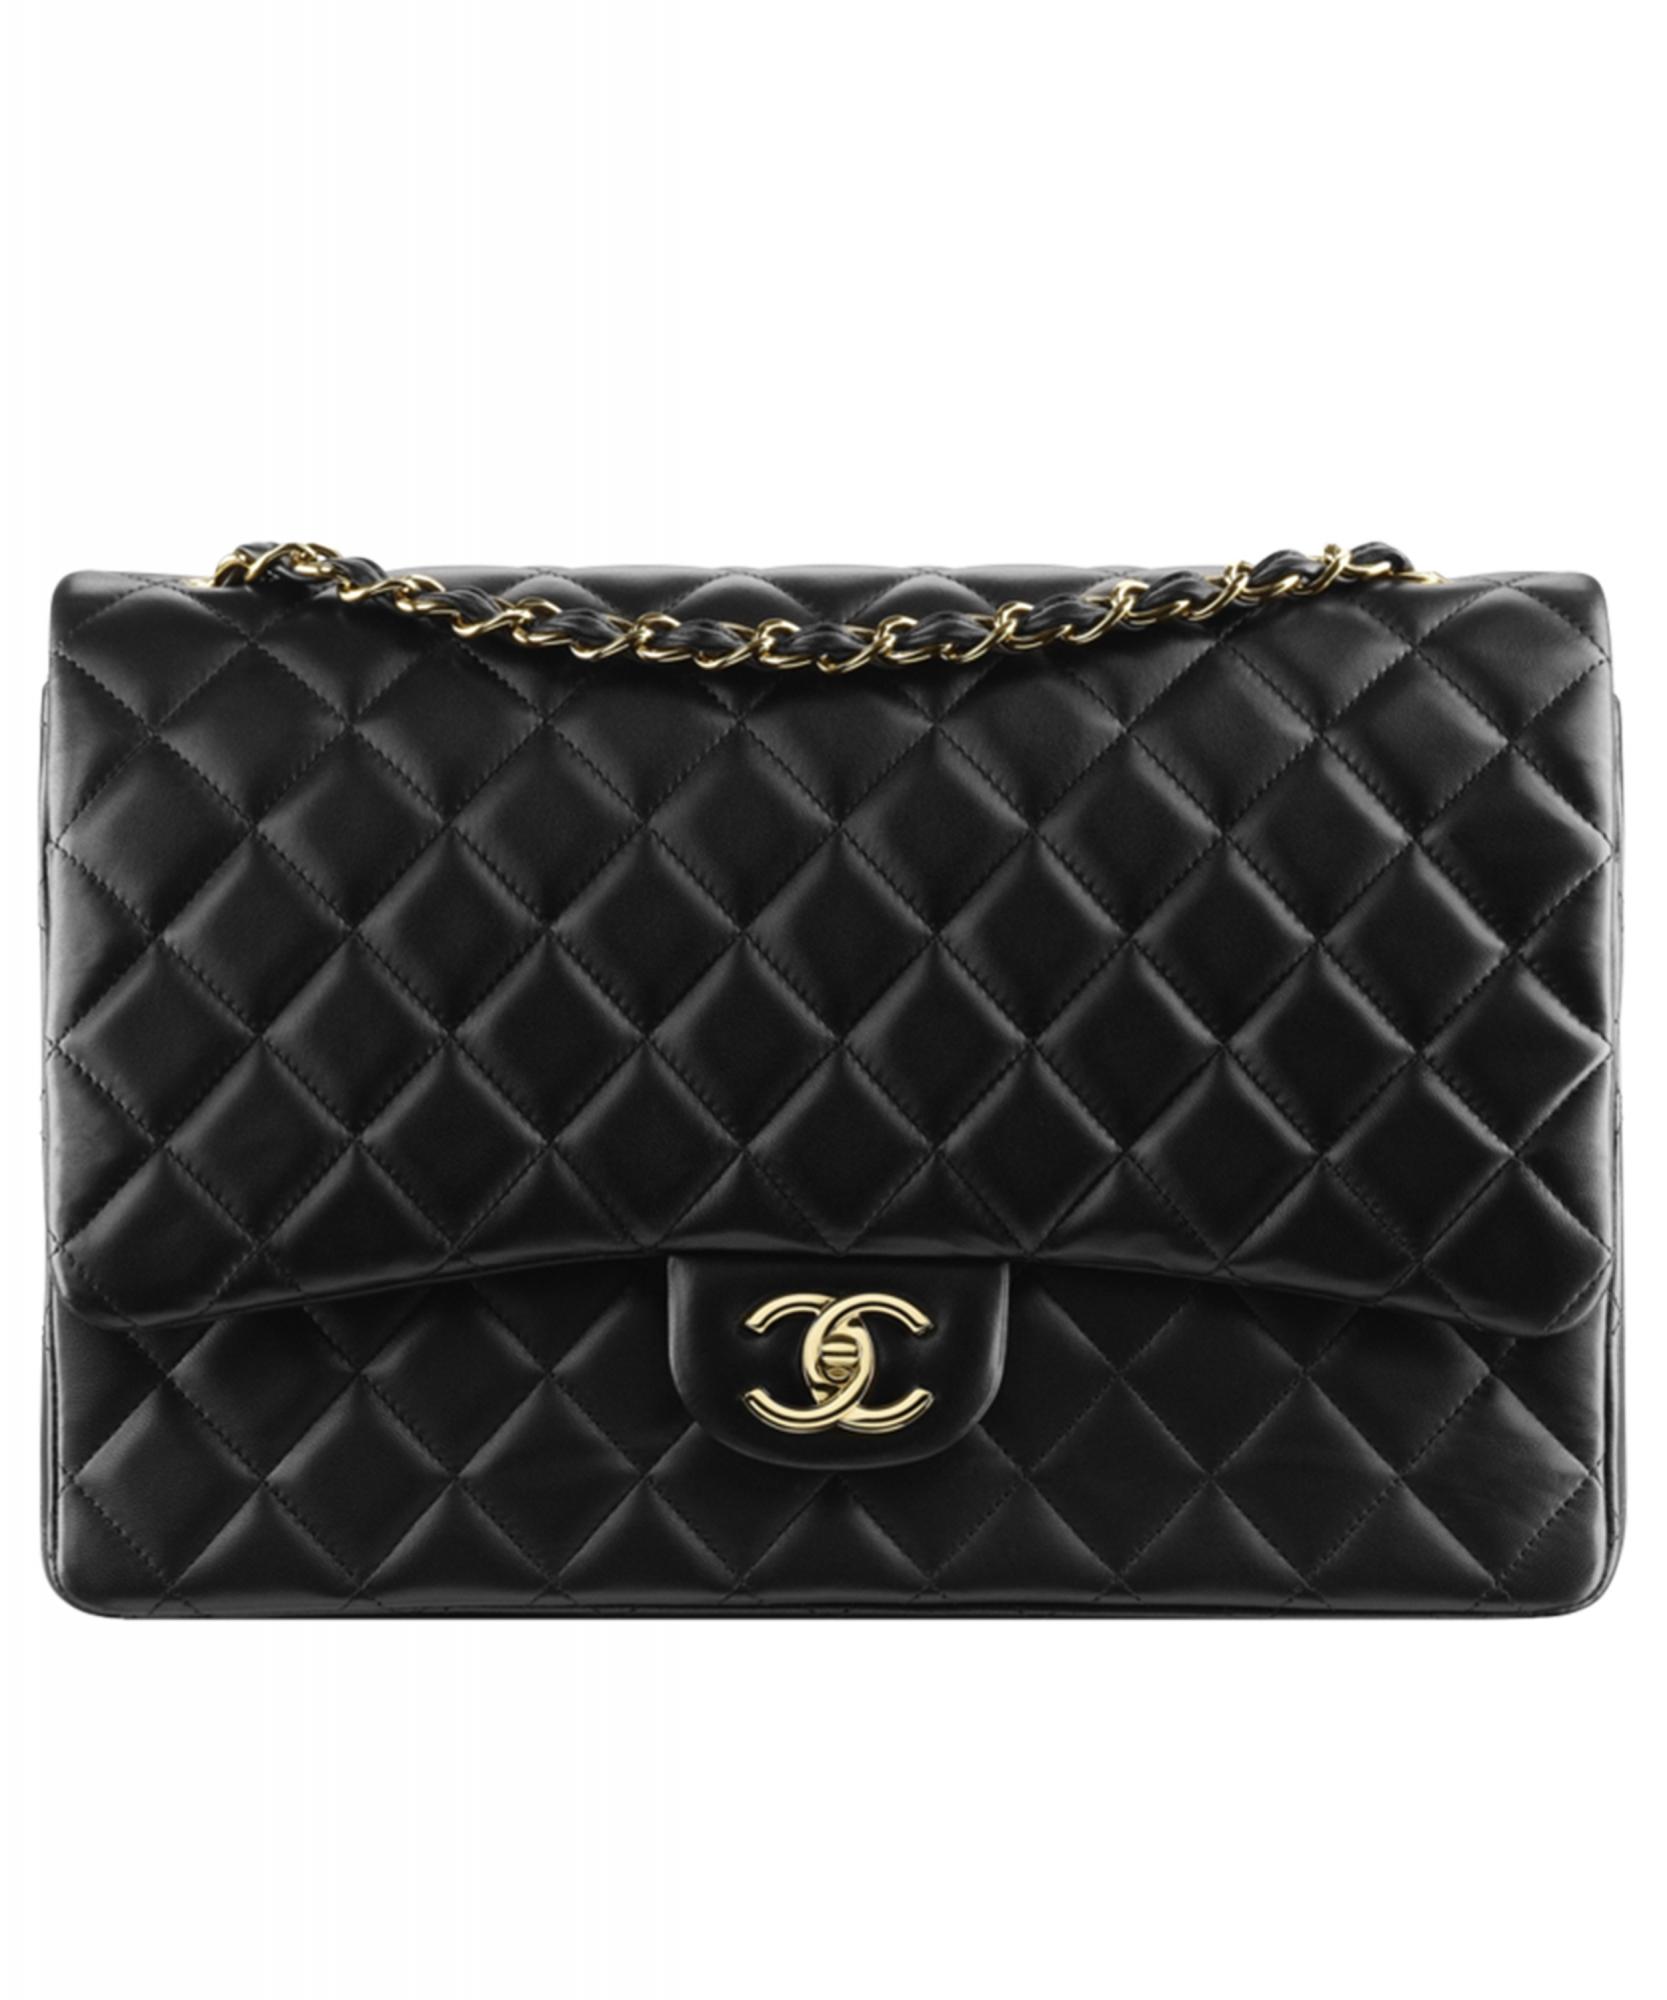 bdbe938e57c11a Chanel Classic Single GHW Flap Bag - Maxi   La Doyenne